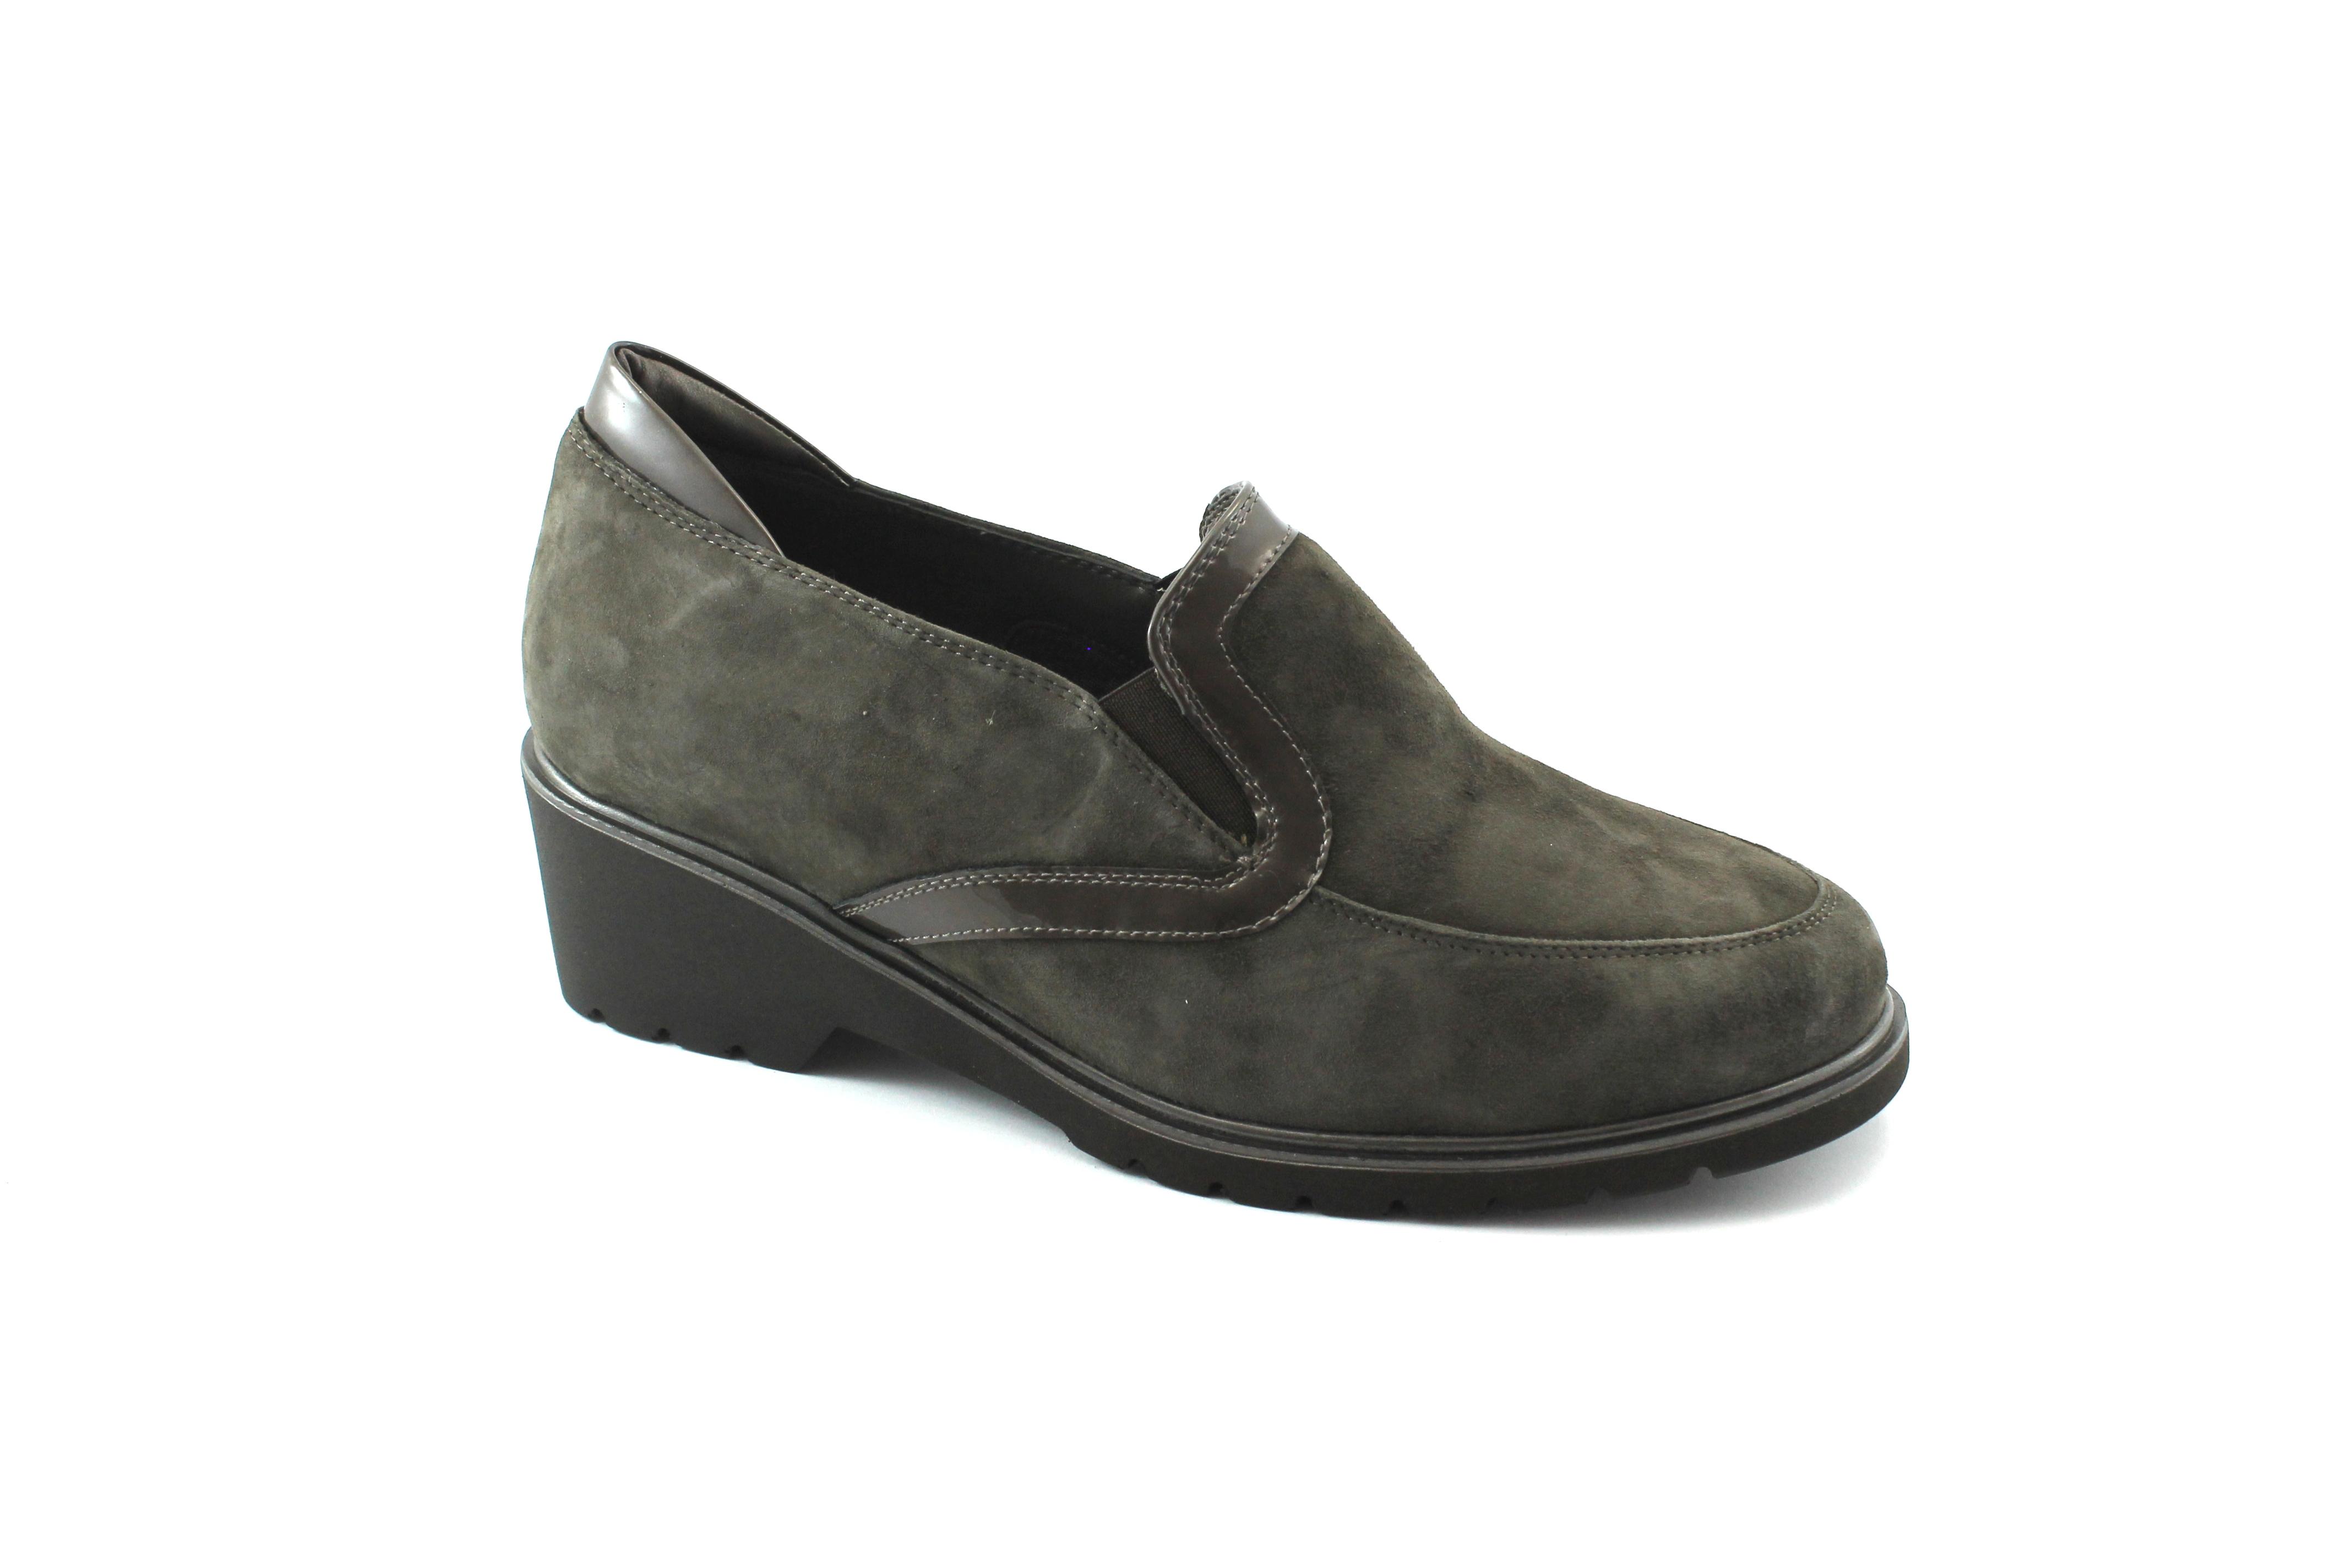 MELLUSO R35723 comfort piombo  grigio scarpe donna comfort R35723  piombo  f92def